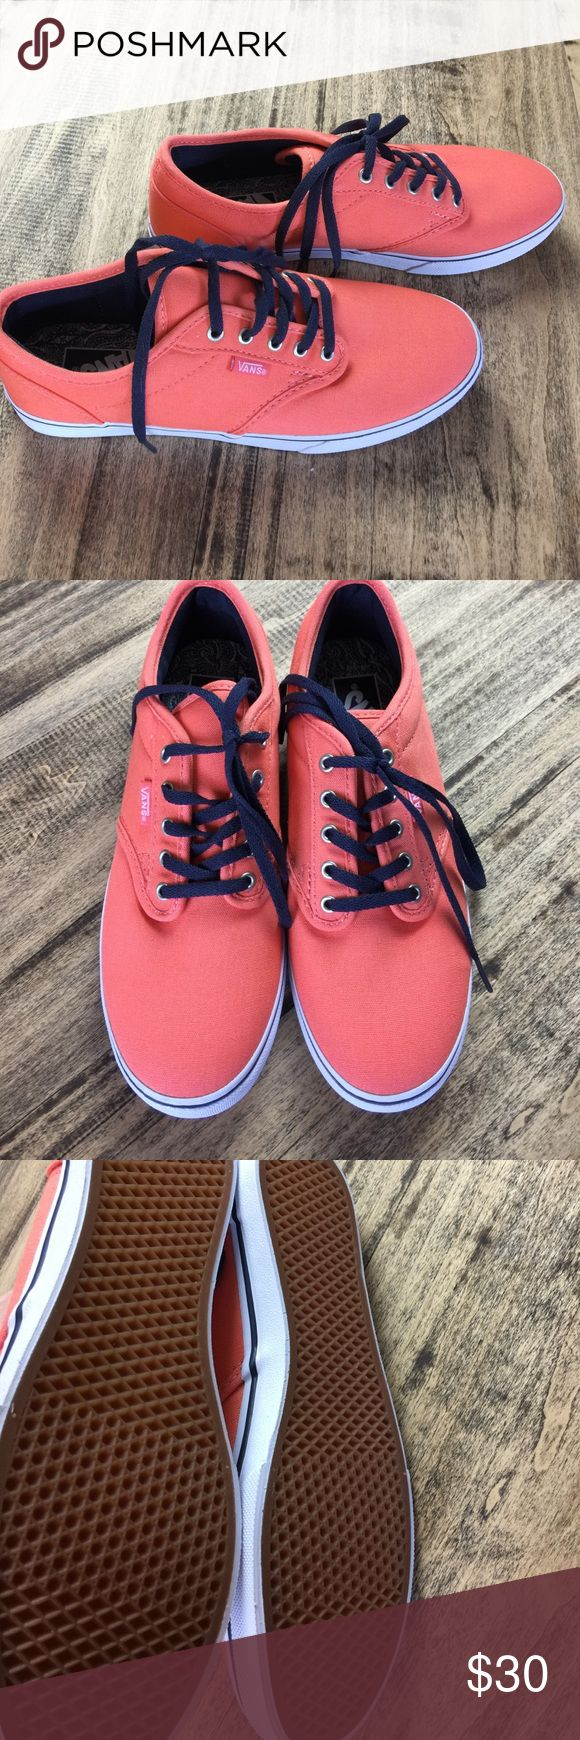 VANS melon/orange sneakers Women's 6 NEW shoes VANS melon/orange sneakers Women's 6 shoes. New without box, never worn just tried on. Vans Shoes Sneakers